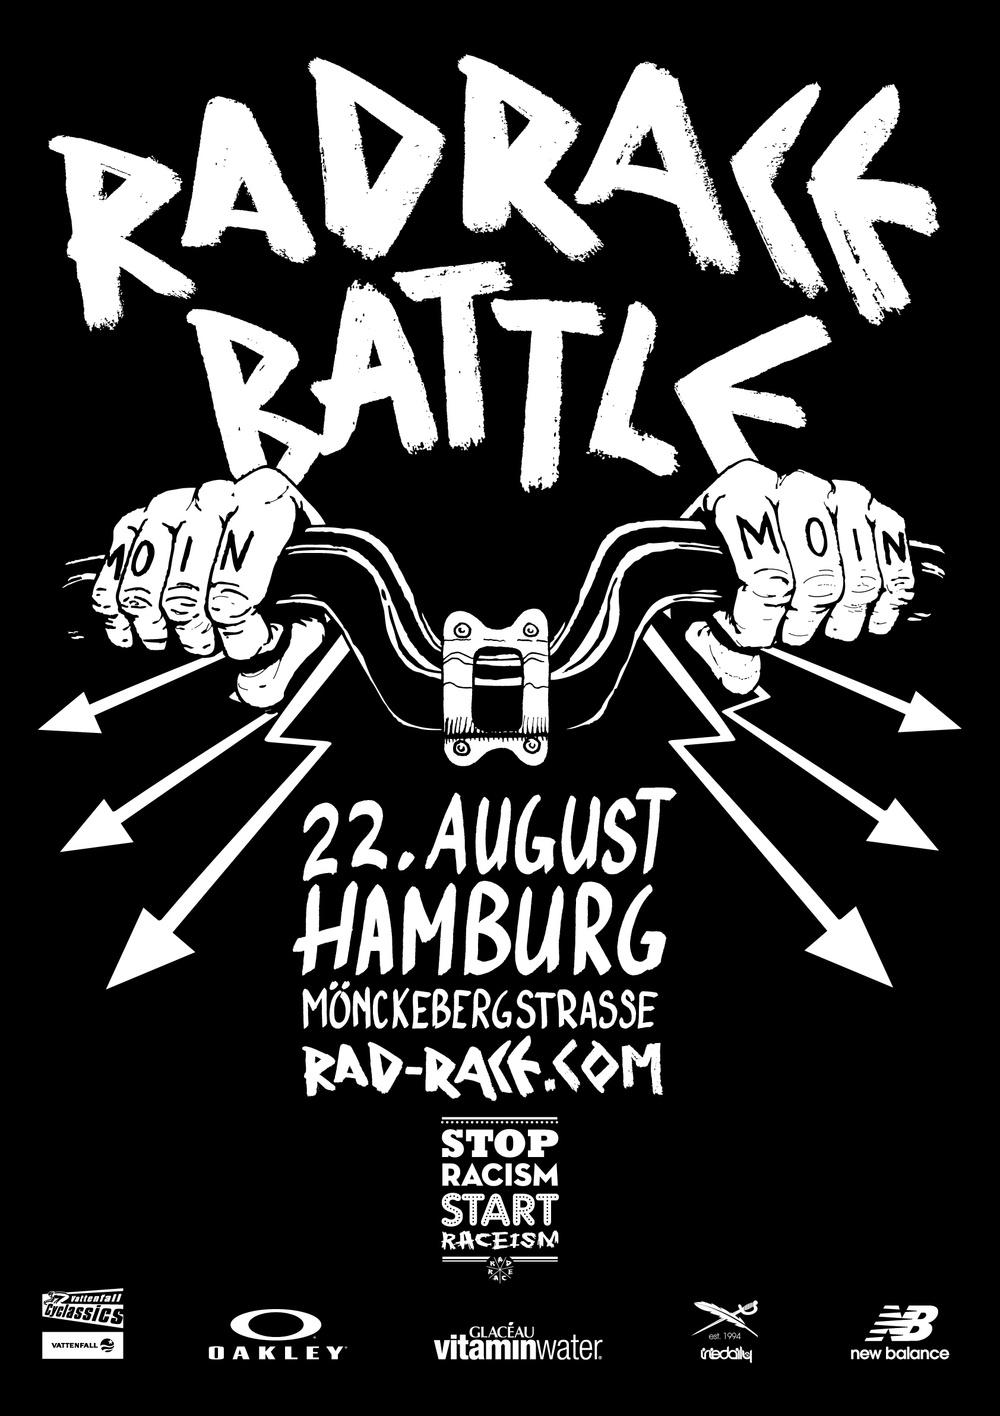 RAD RACE BATTLE HAMBURG 22.08.2015